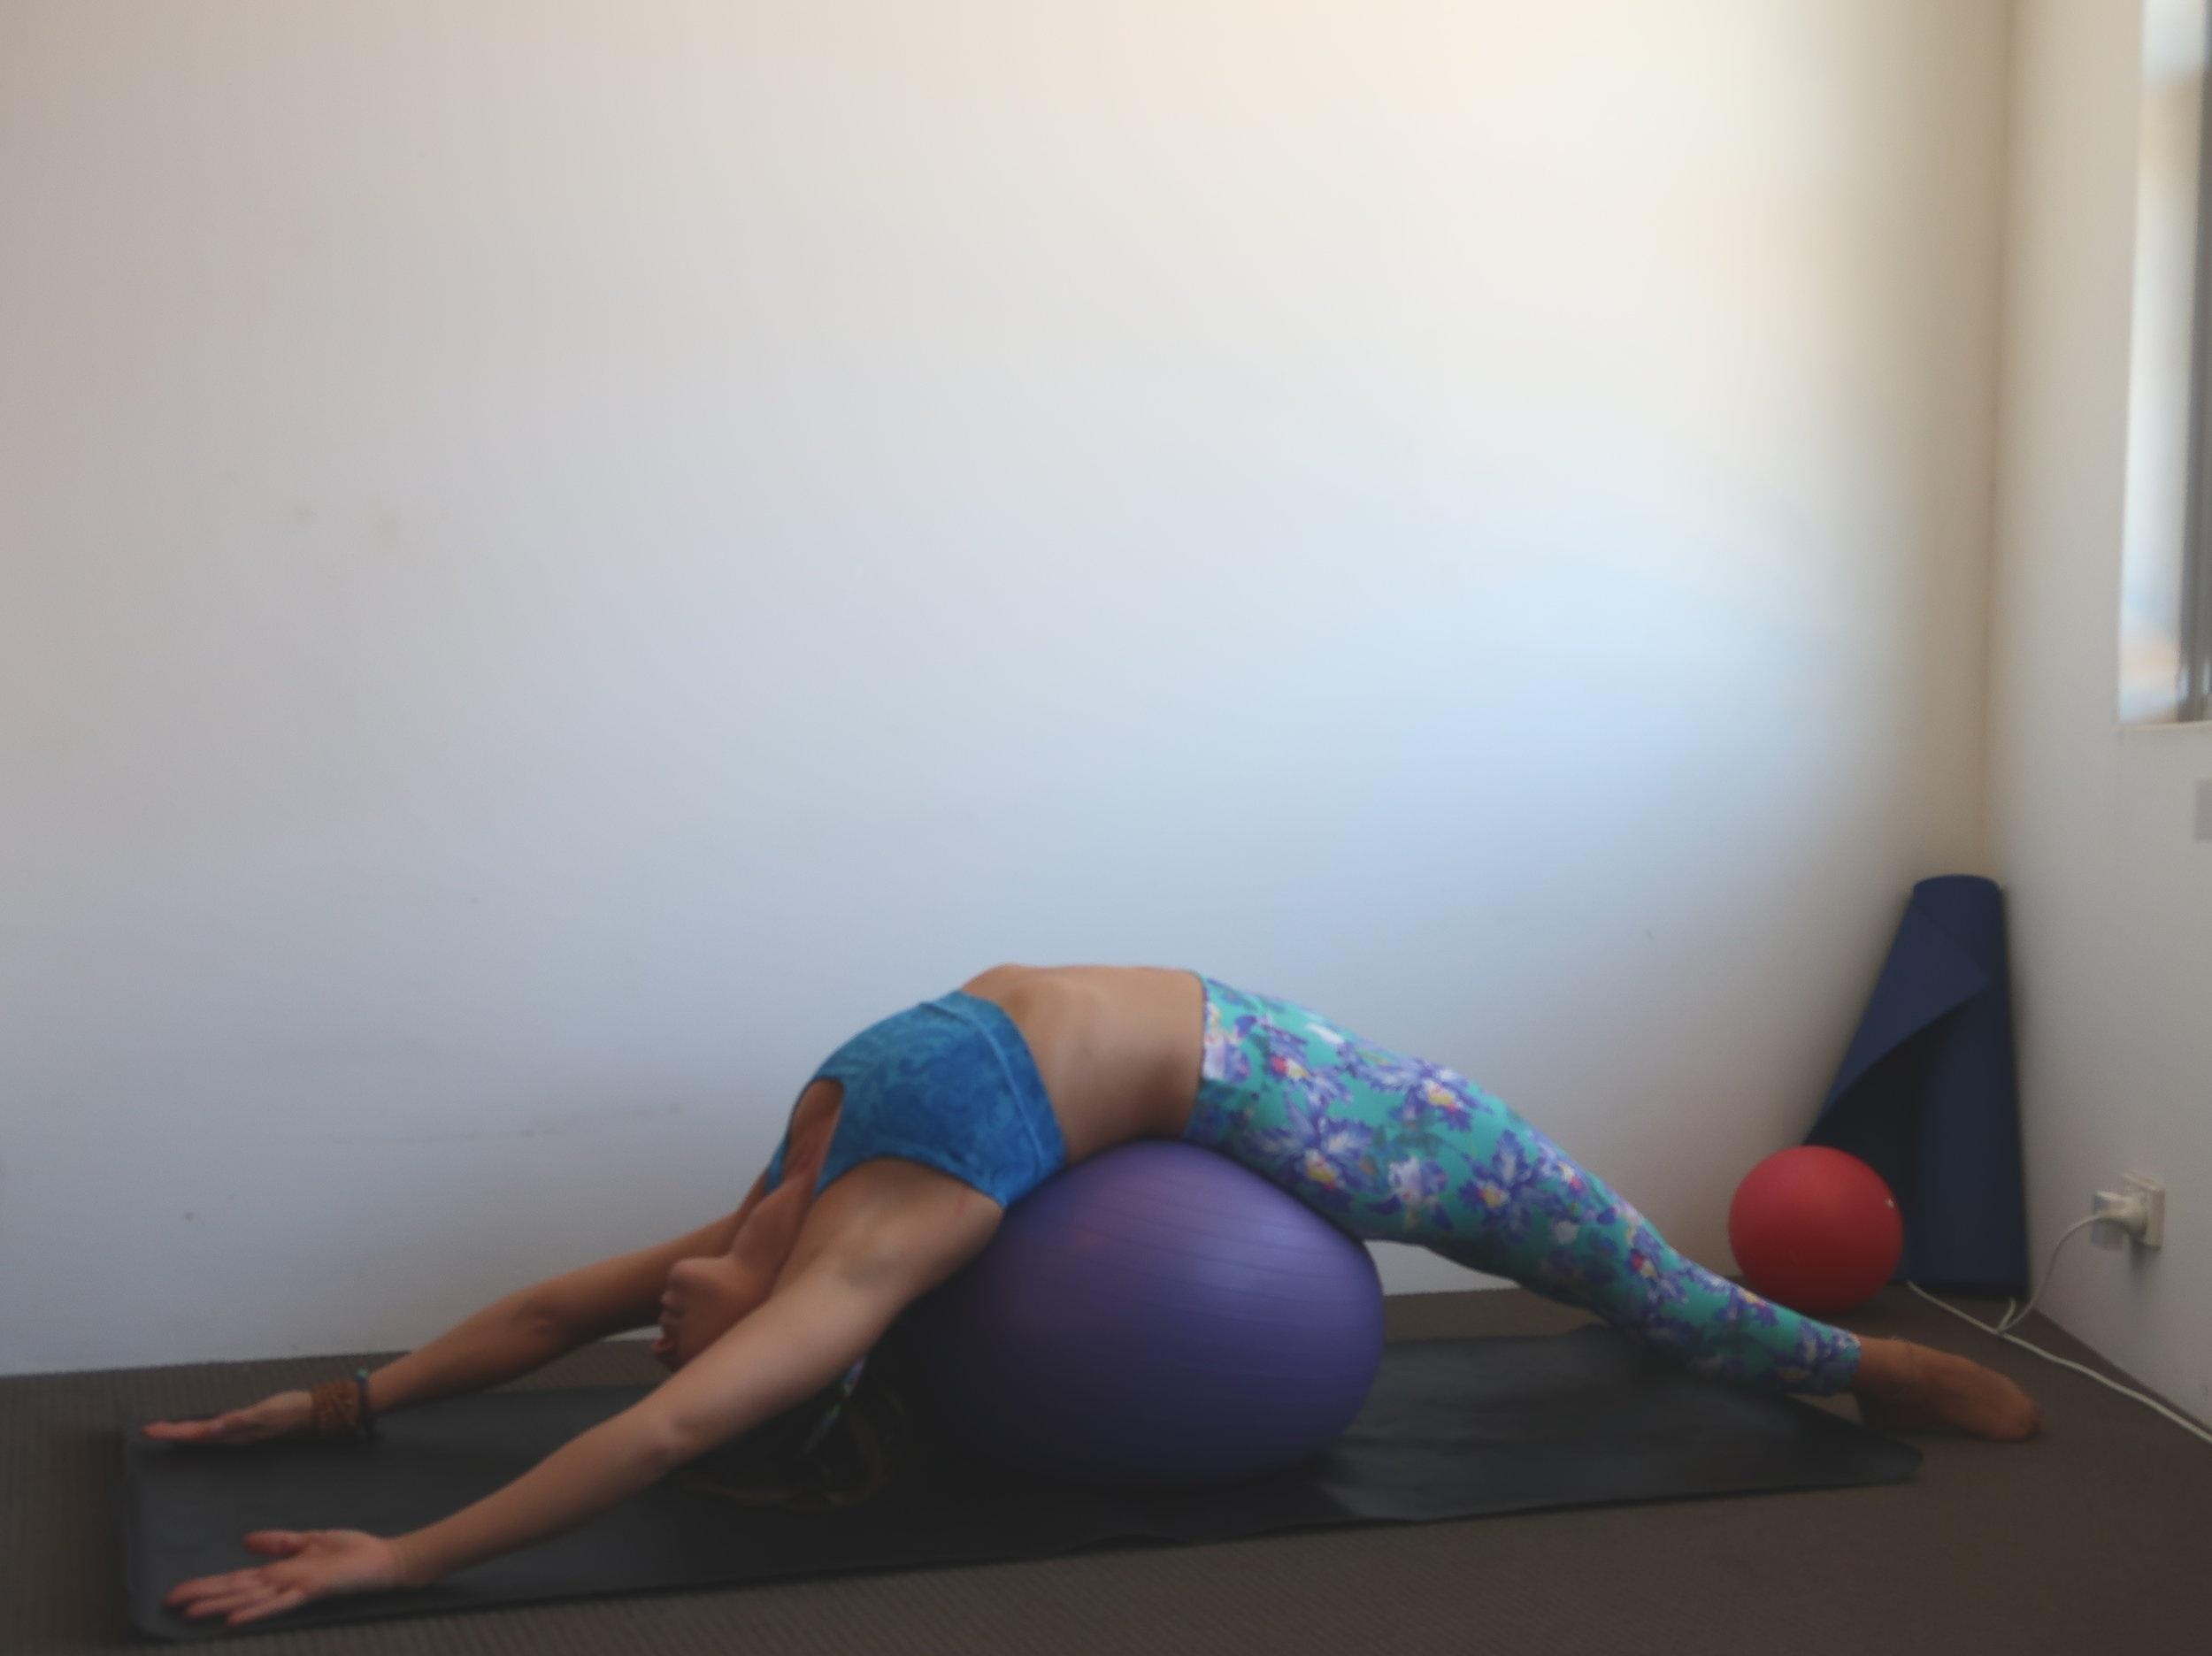 Backbend stretch x 30 seconds